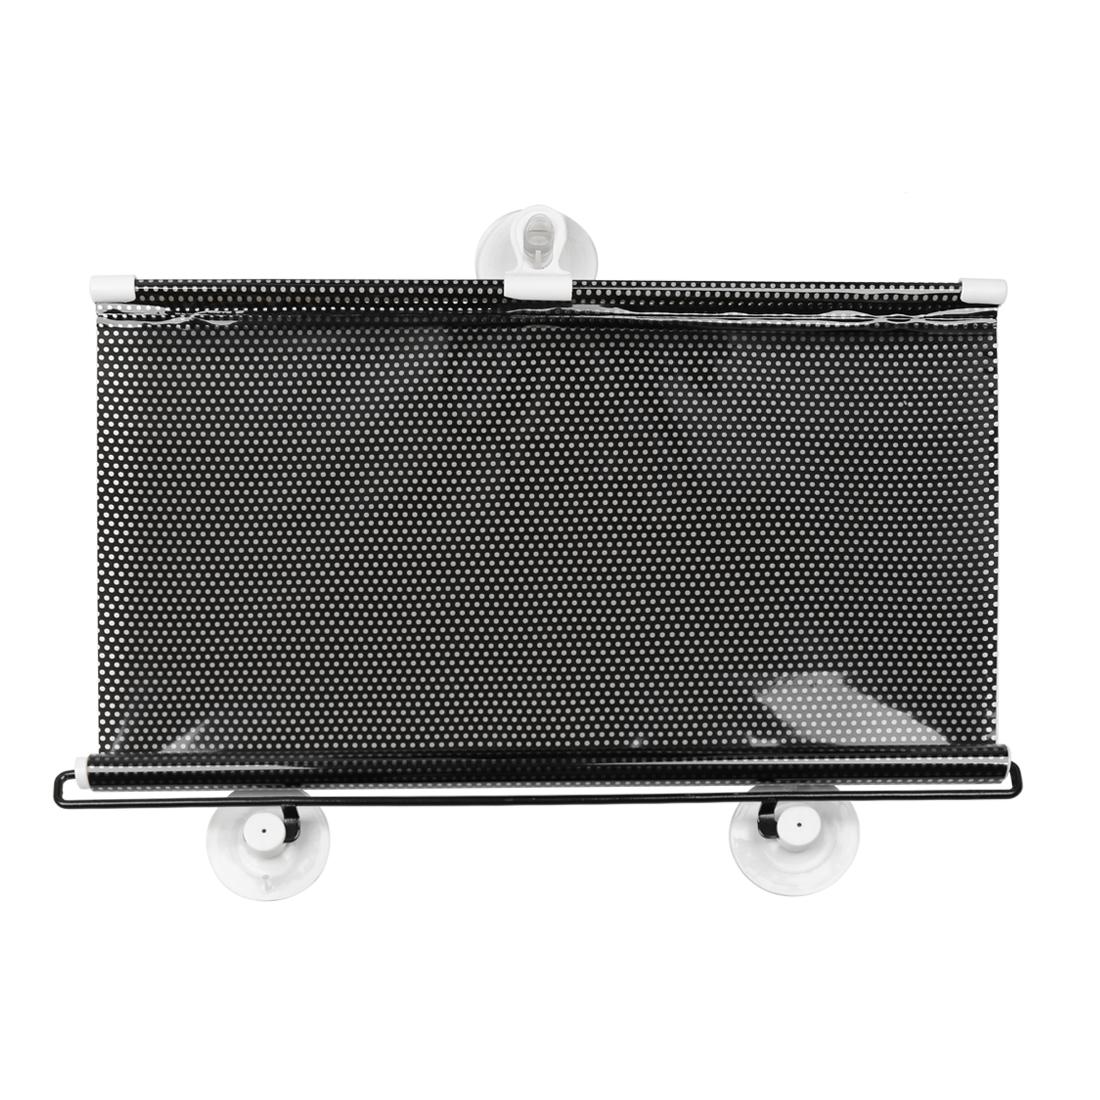 40cmx60cm Black Auto Car Sides Window Vinyl Auto-roll Foldable Guard Sun Shade Sunshade